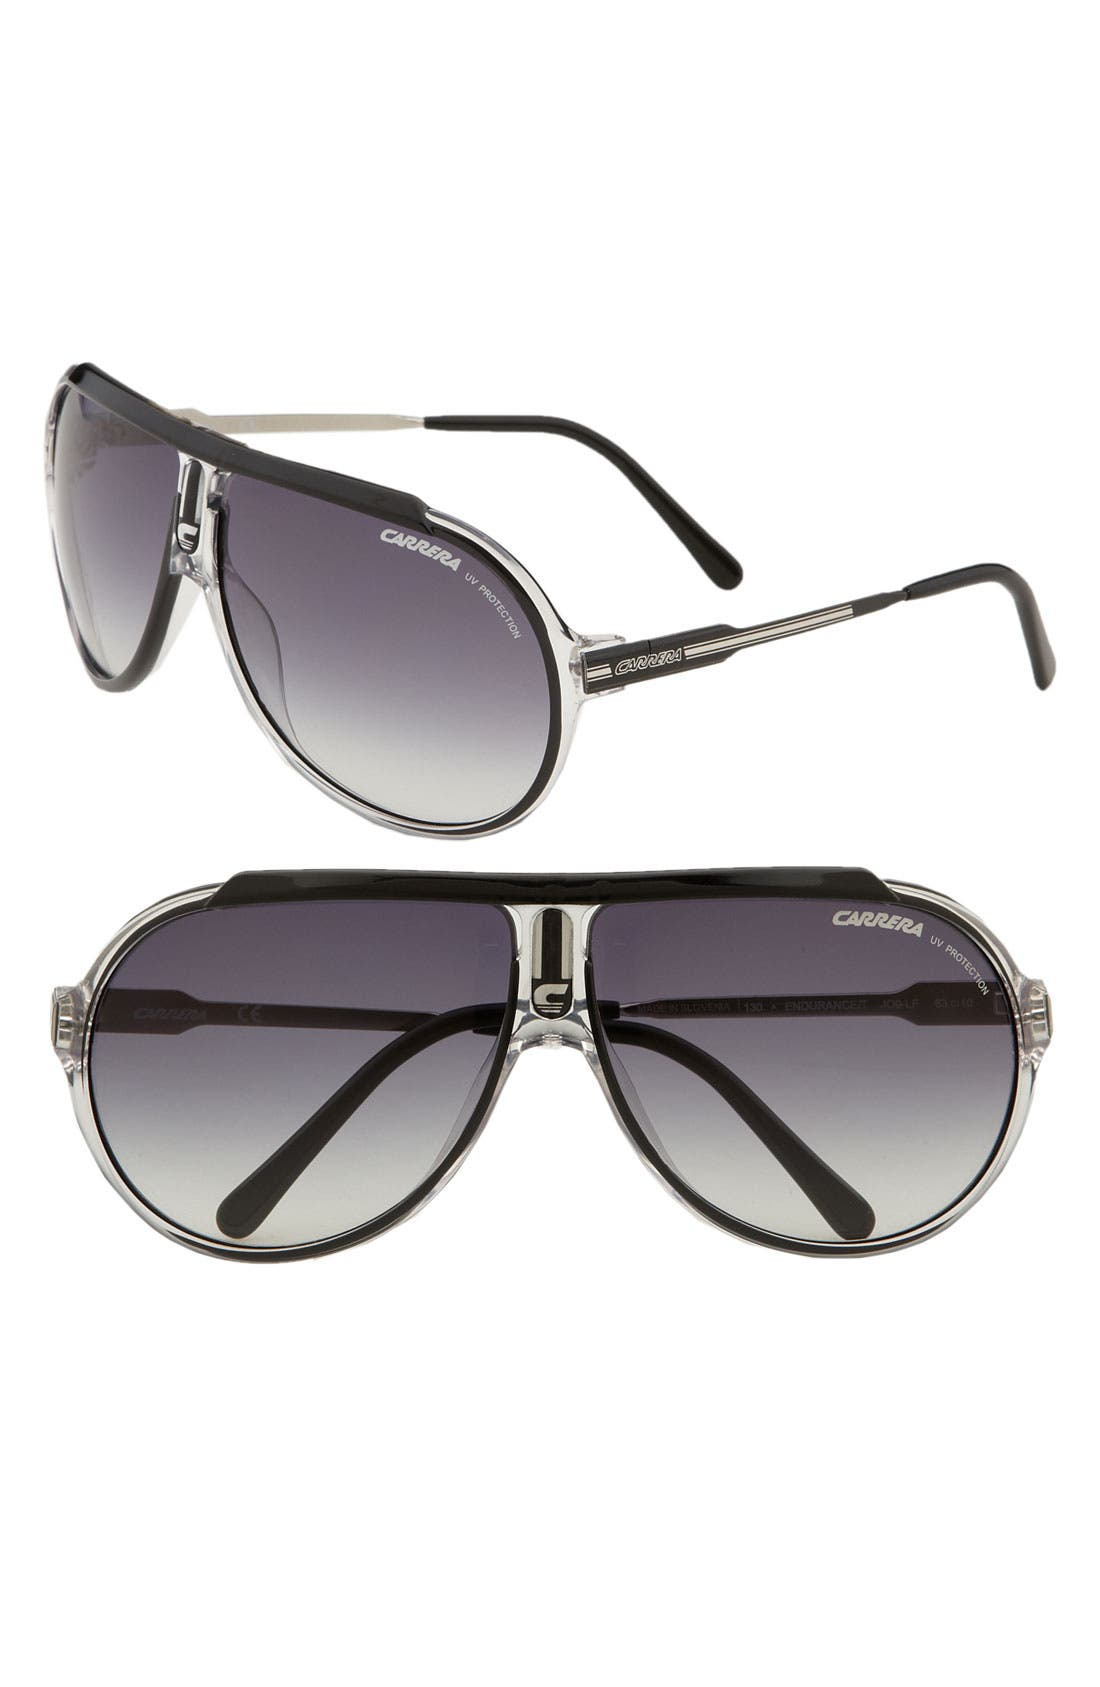 Main Image - Carrera Eyewear 'Endurance' 63mm Aviator Sunglasses